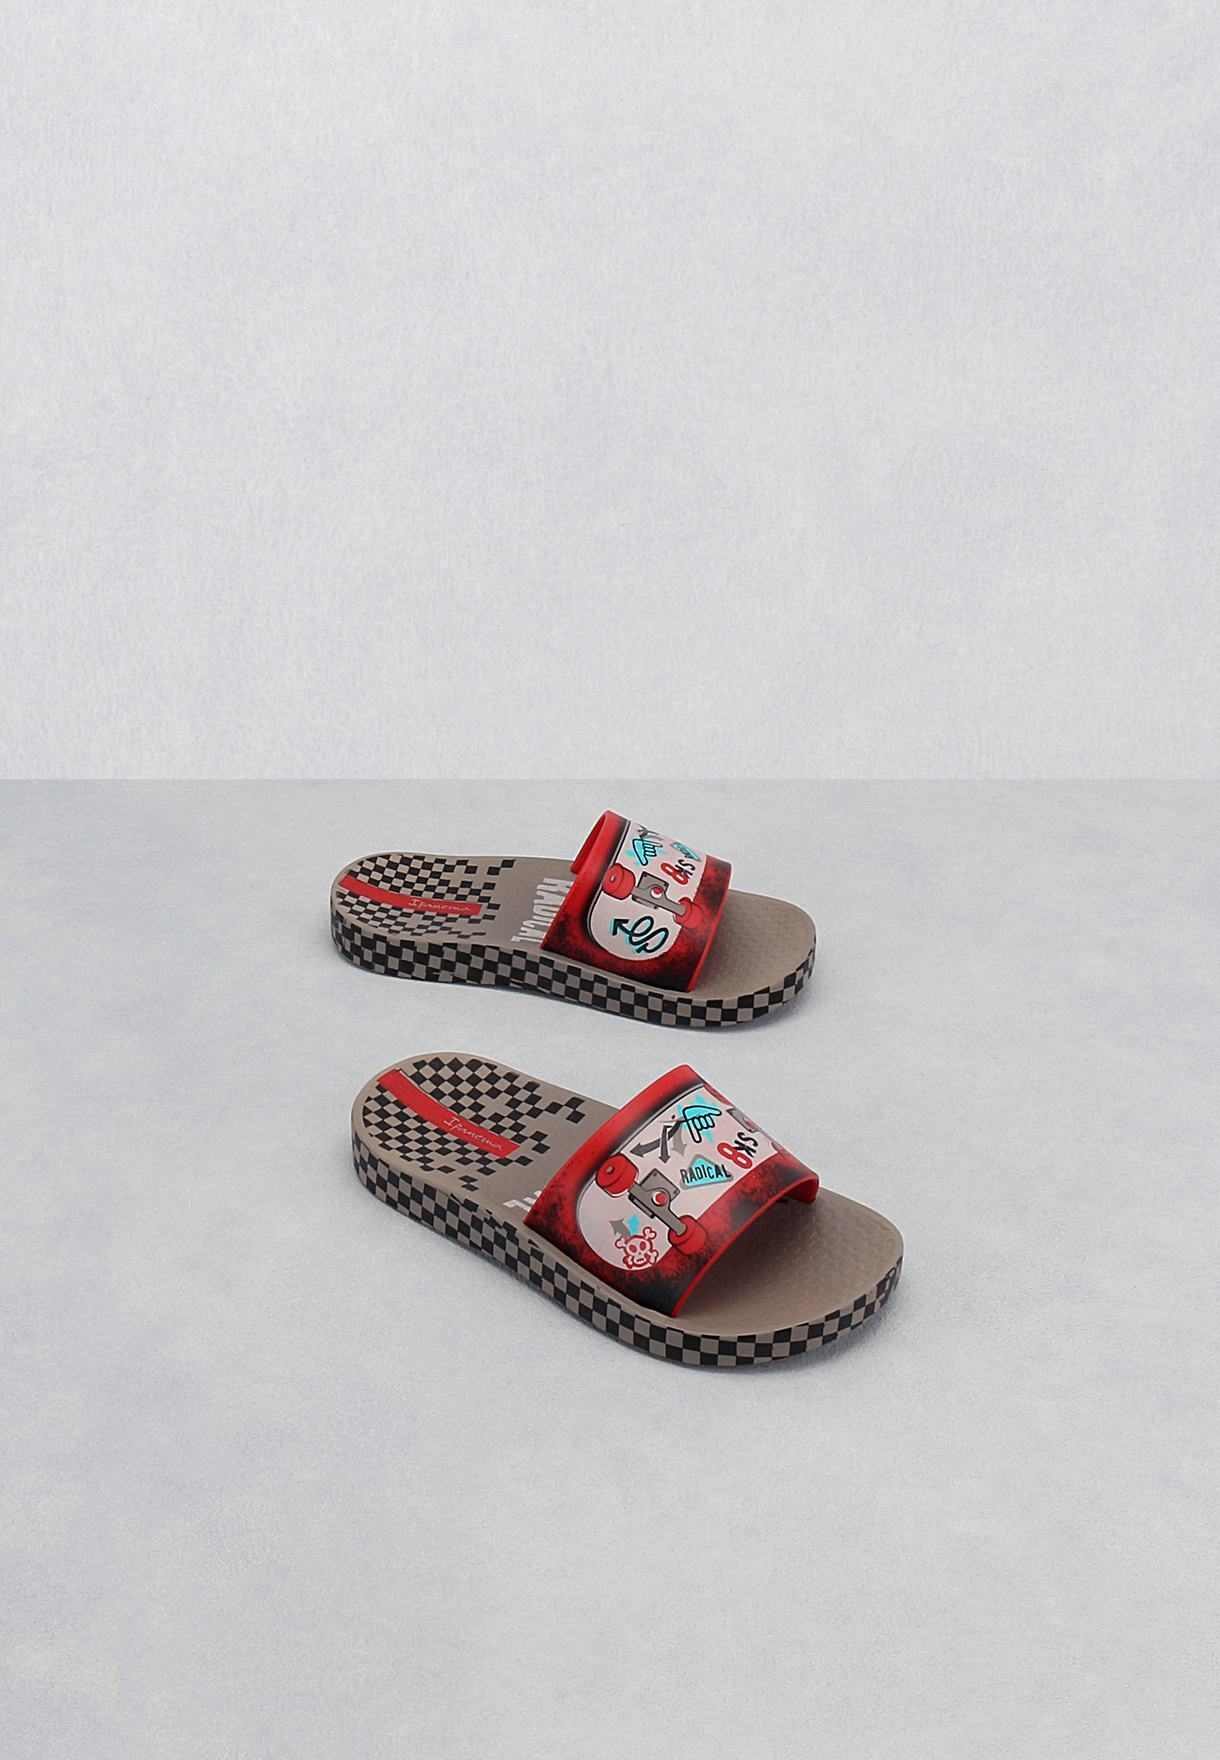 Urban Slide Kids